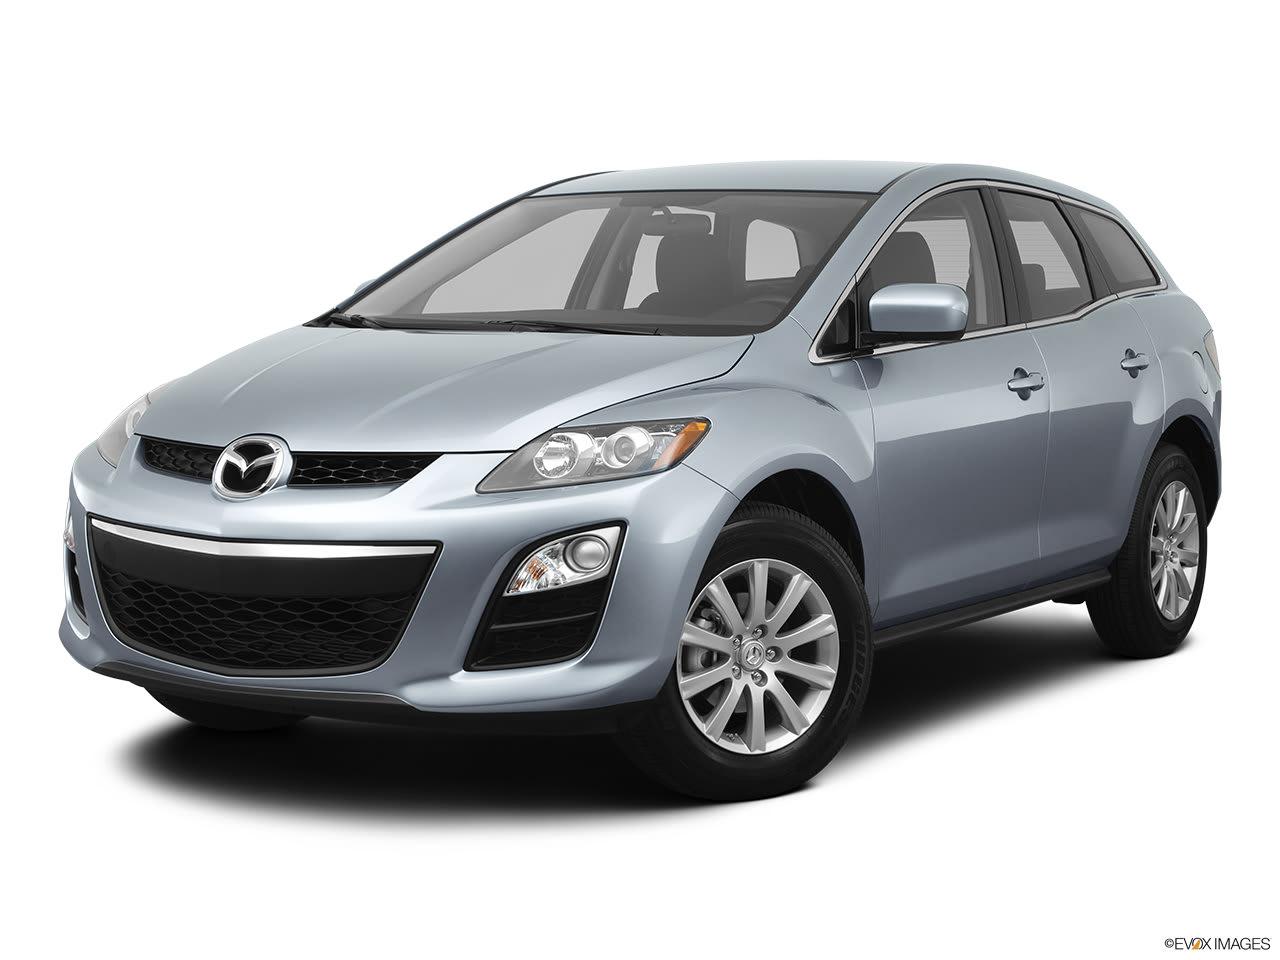 Kelebihan Mazda Cx 7 2012 Top Model Tahun Ini